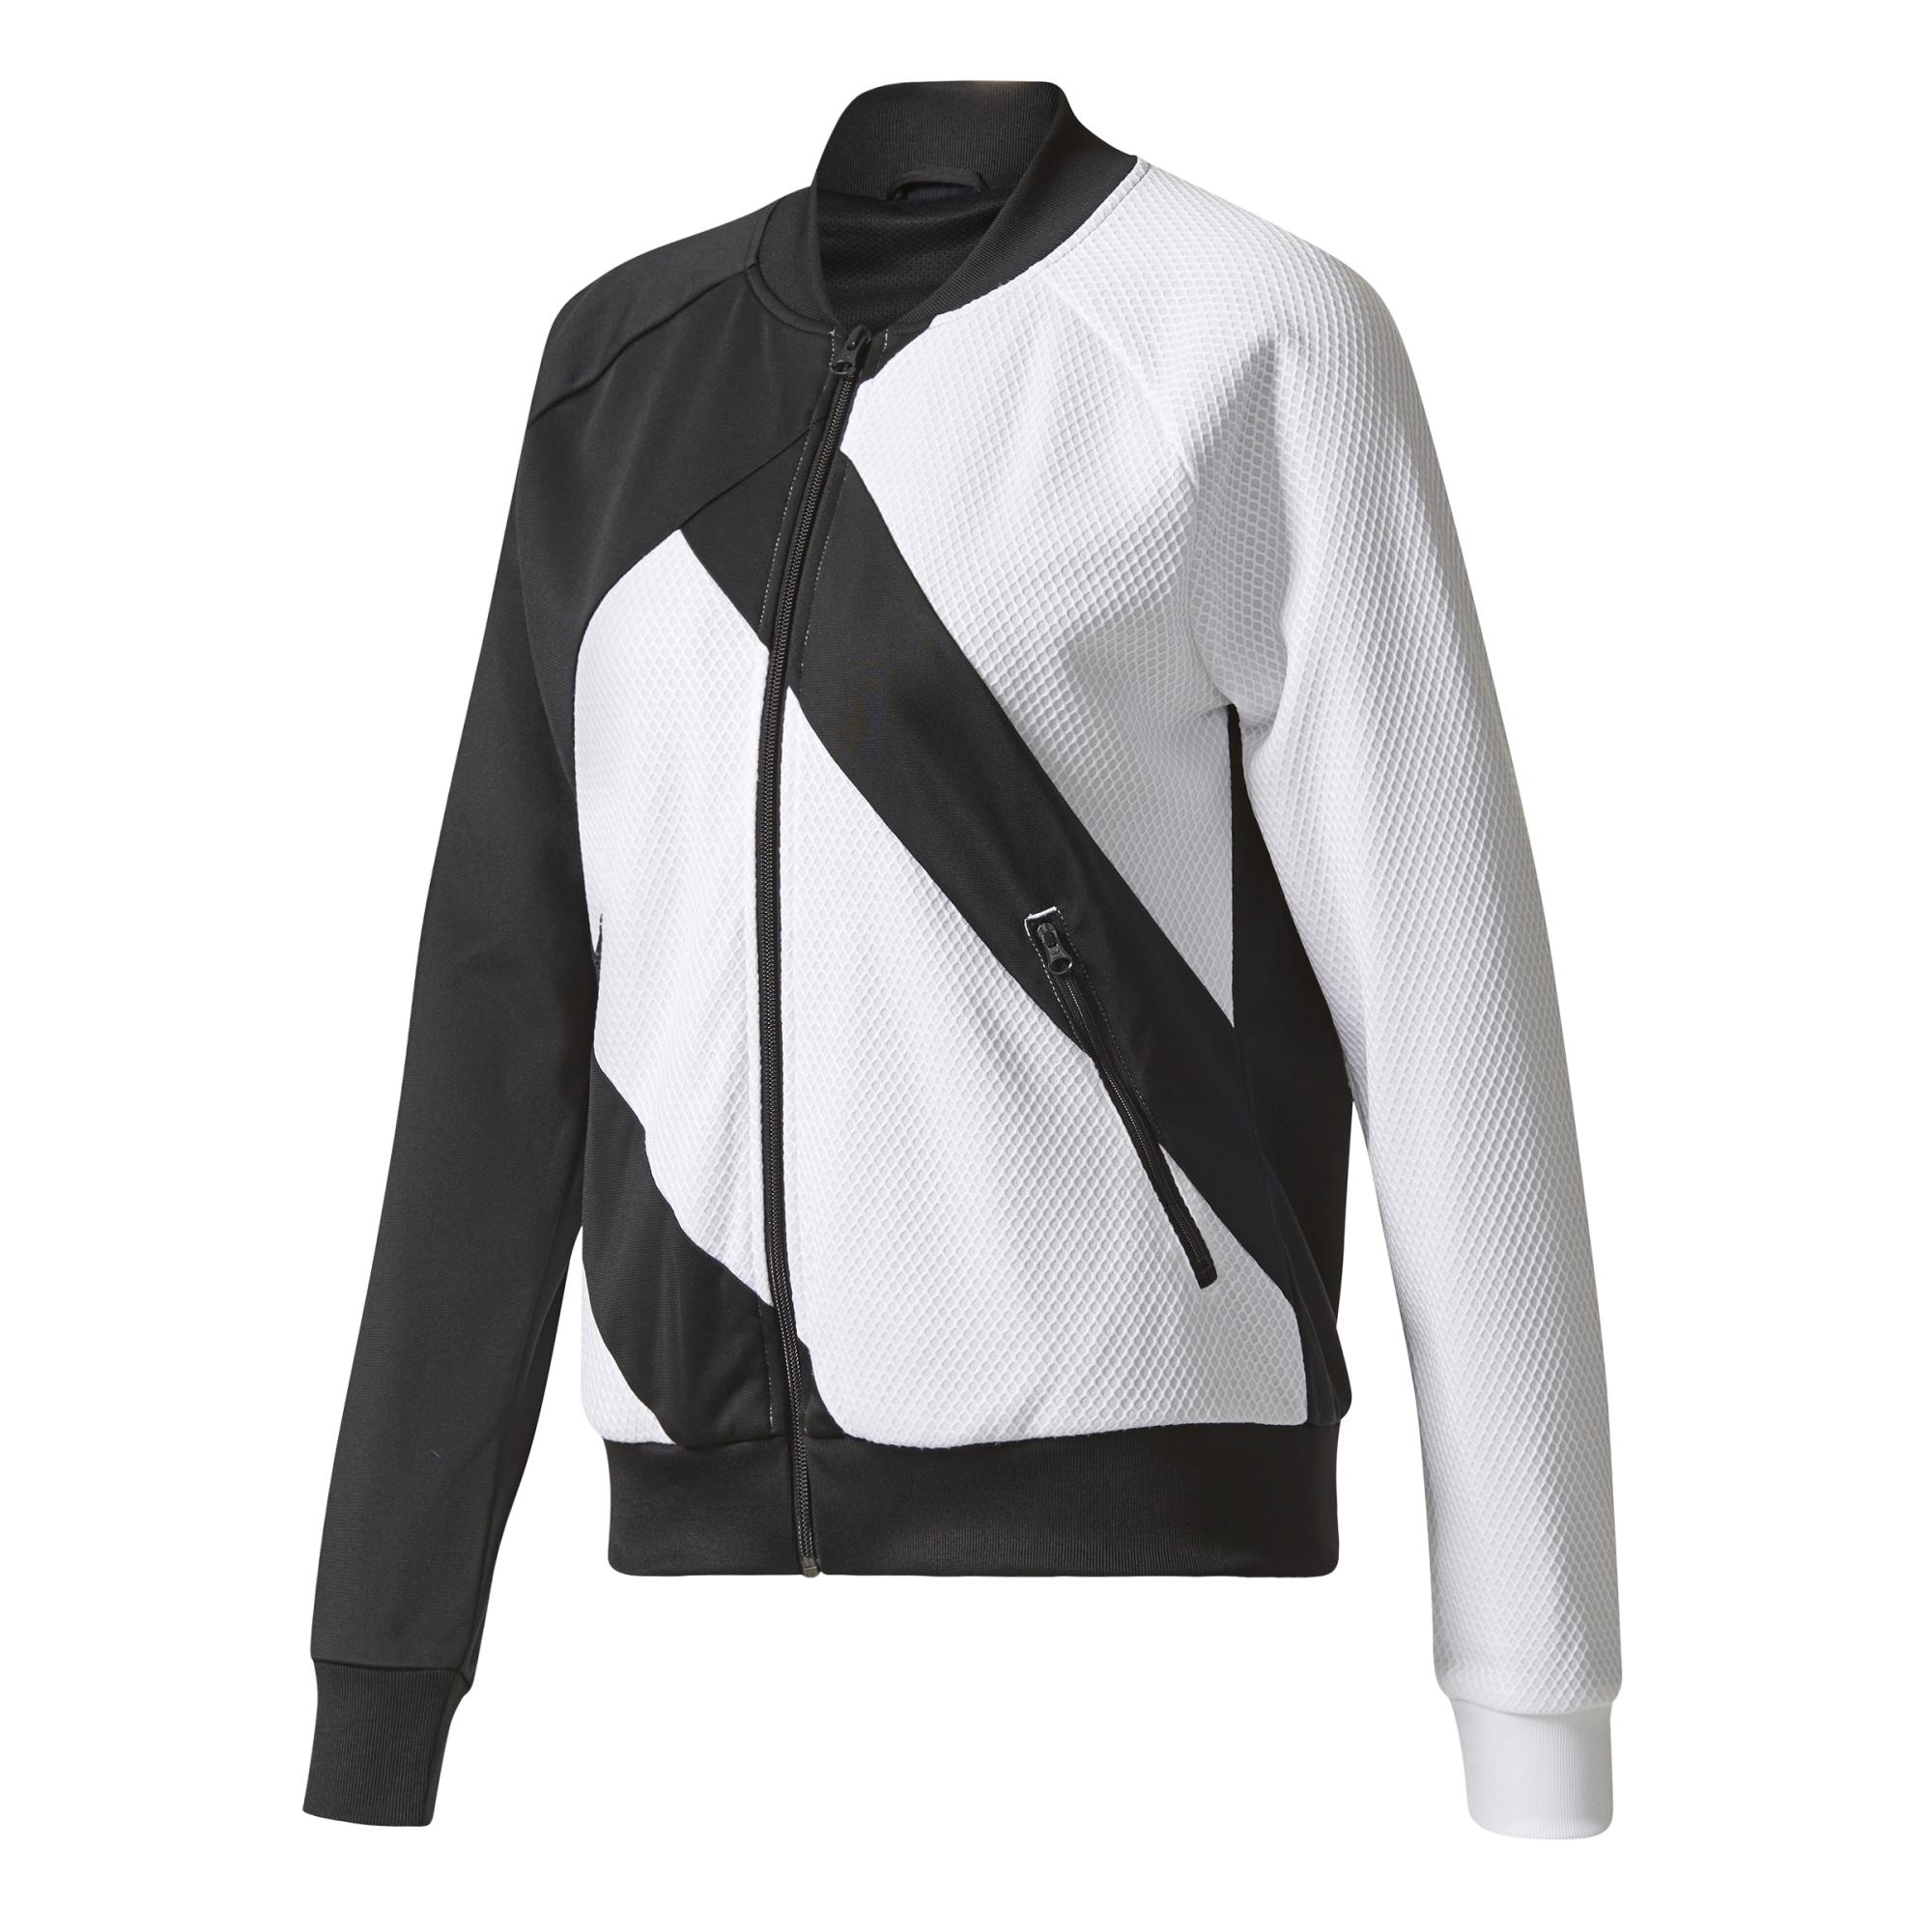 Adidas Originals Equipment Superstar Track Top W (black white) 10ecd1fdfe479